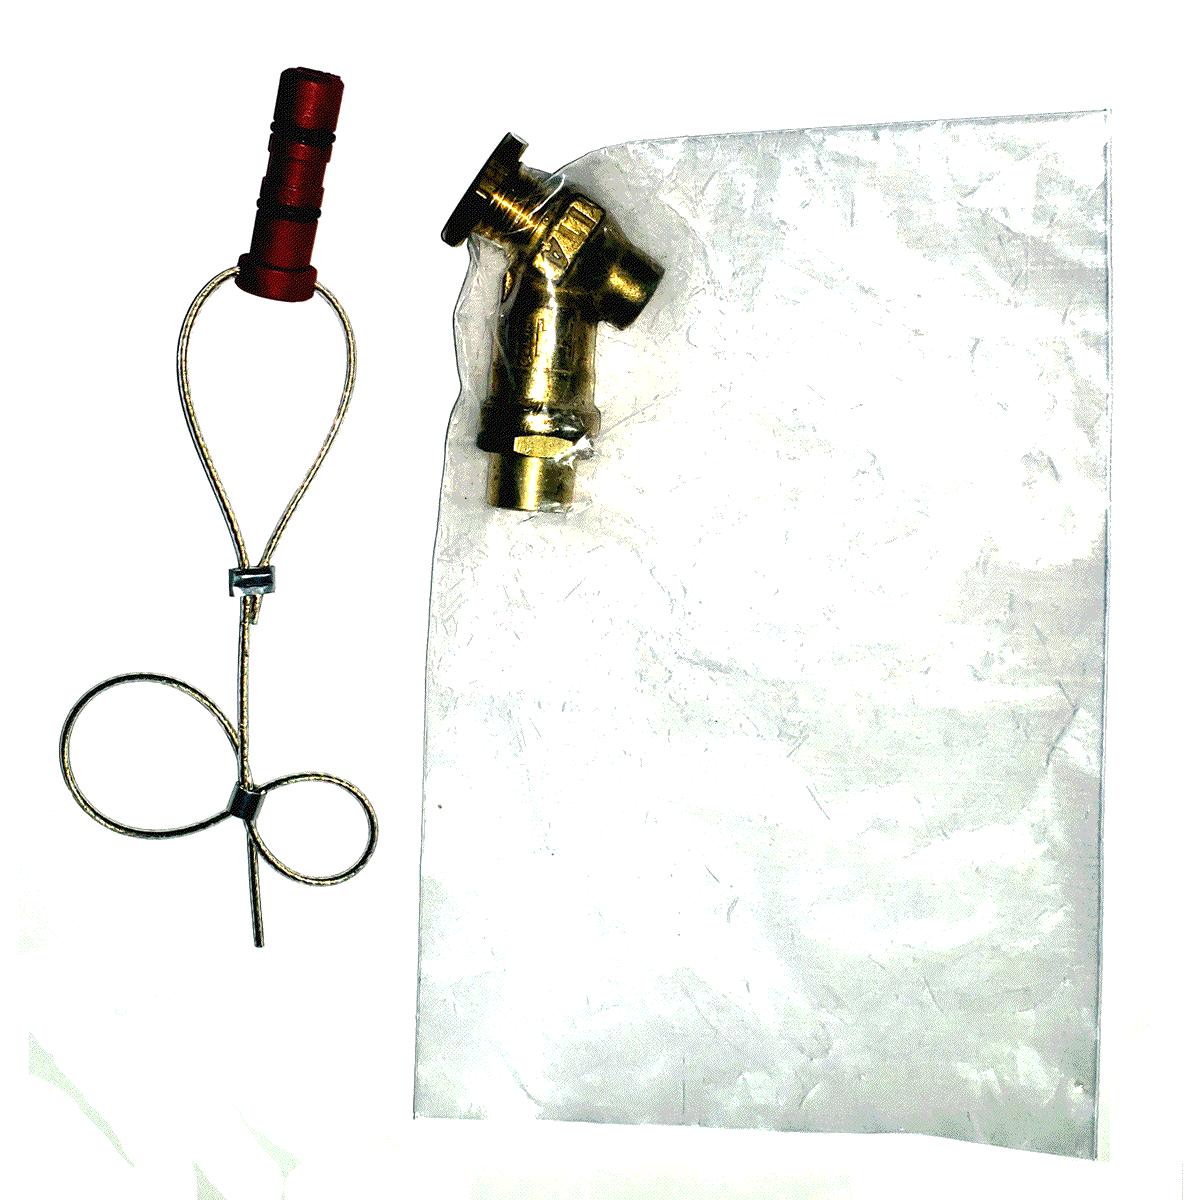 Kit Instalação Válvula Externa ITA Tubo Alta 2 Niples e 2 Anilhas